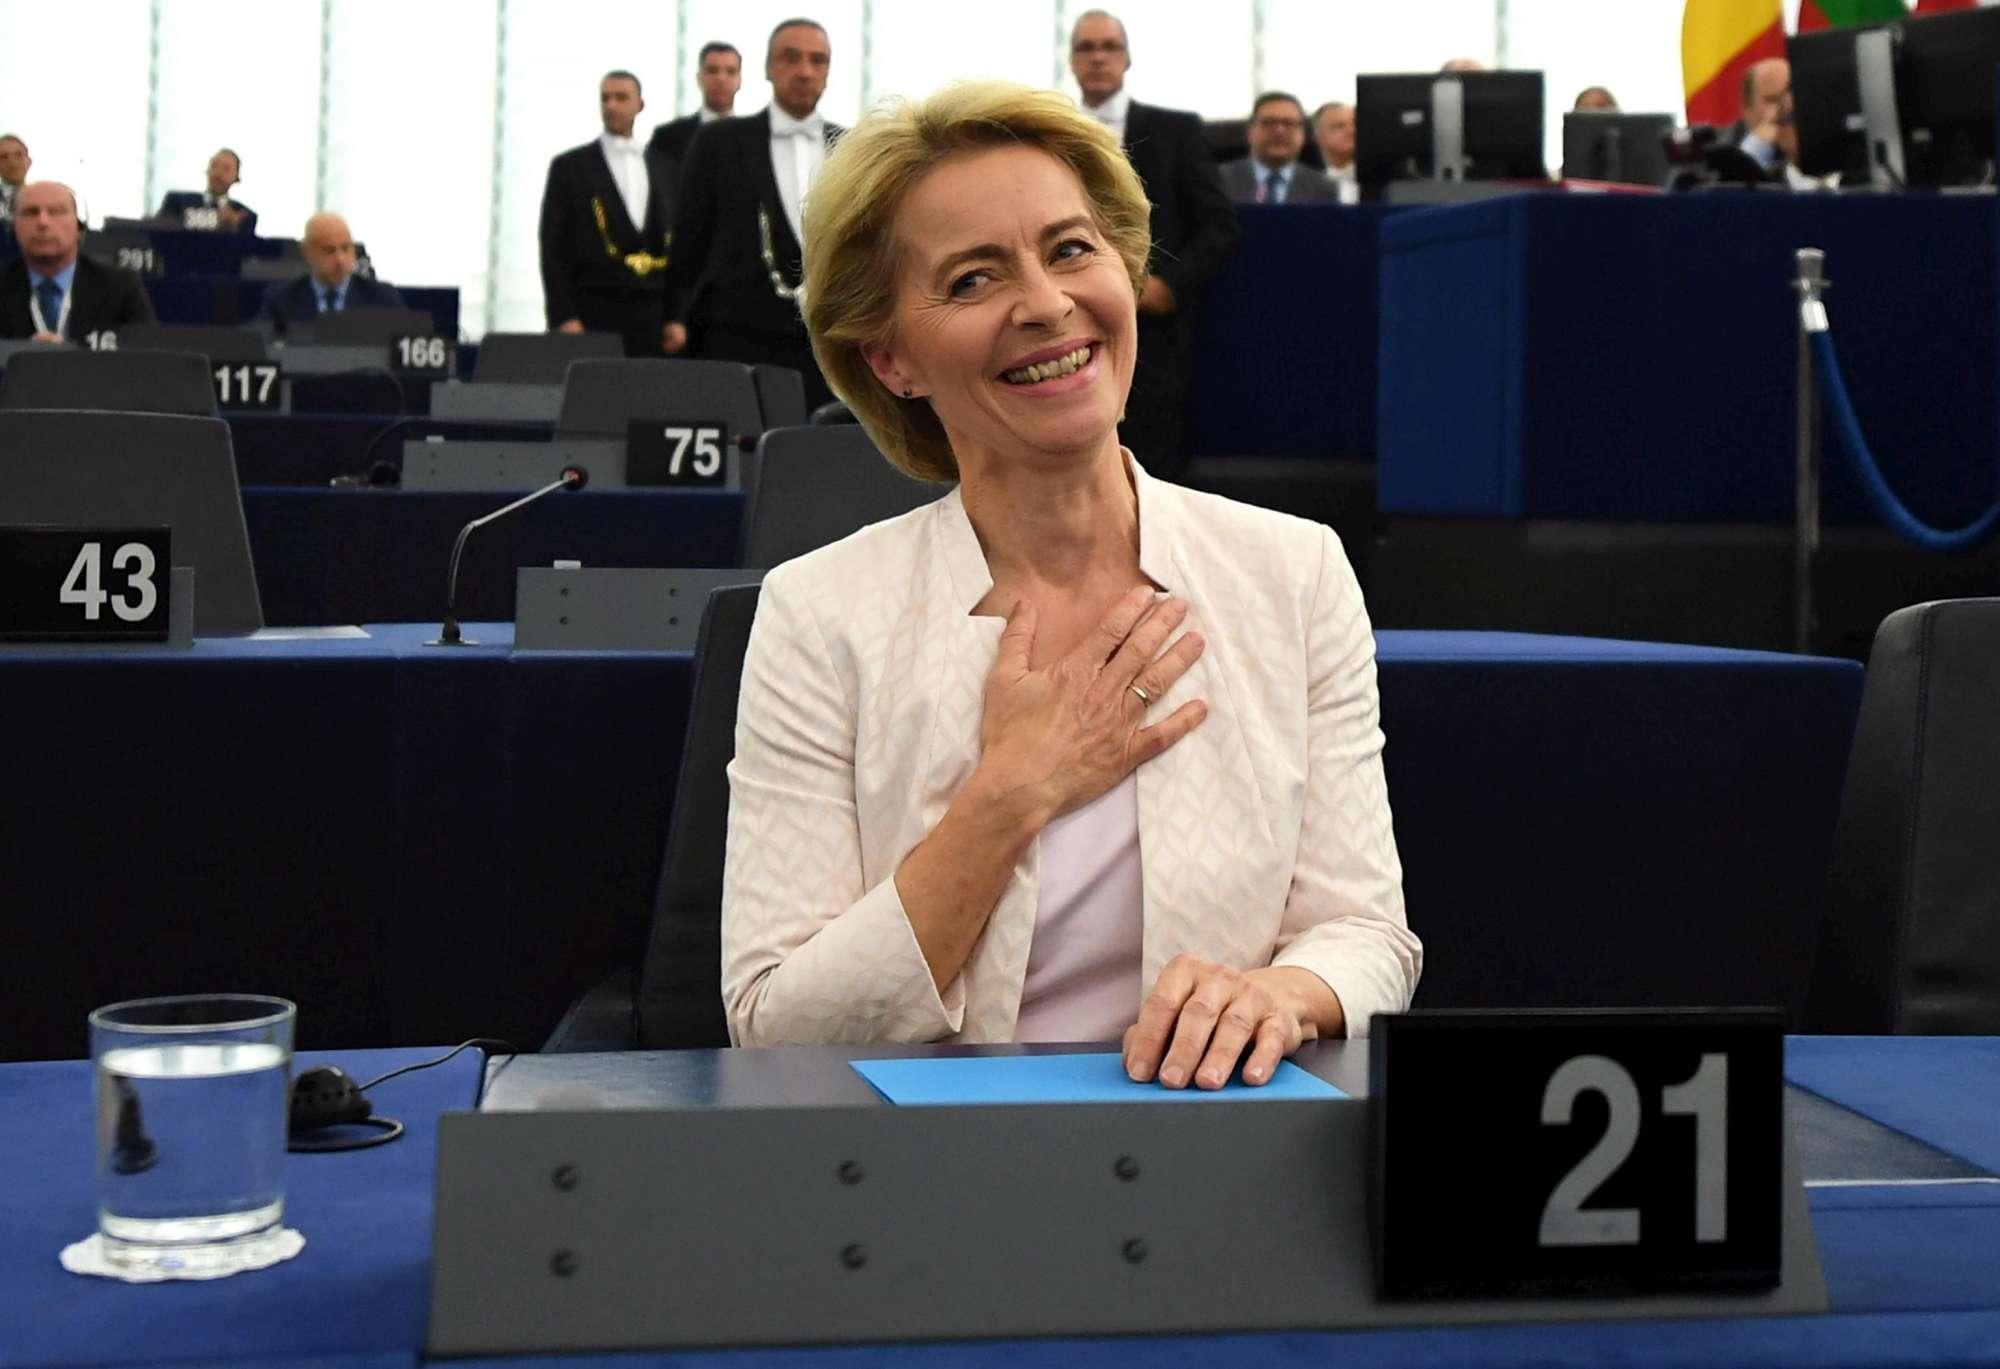 Ue, l elezione di Ursula Von der Leyen